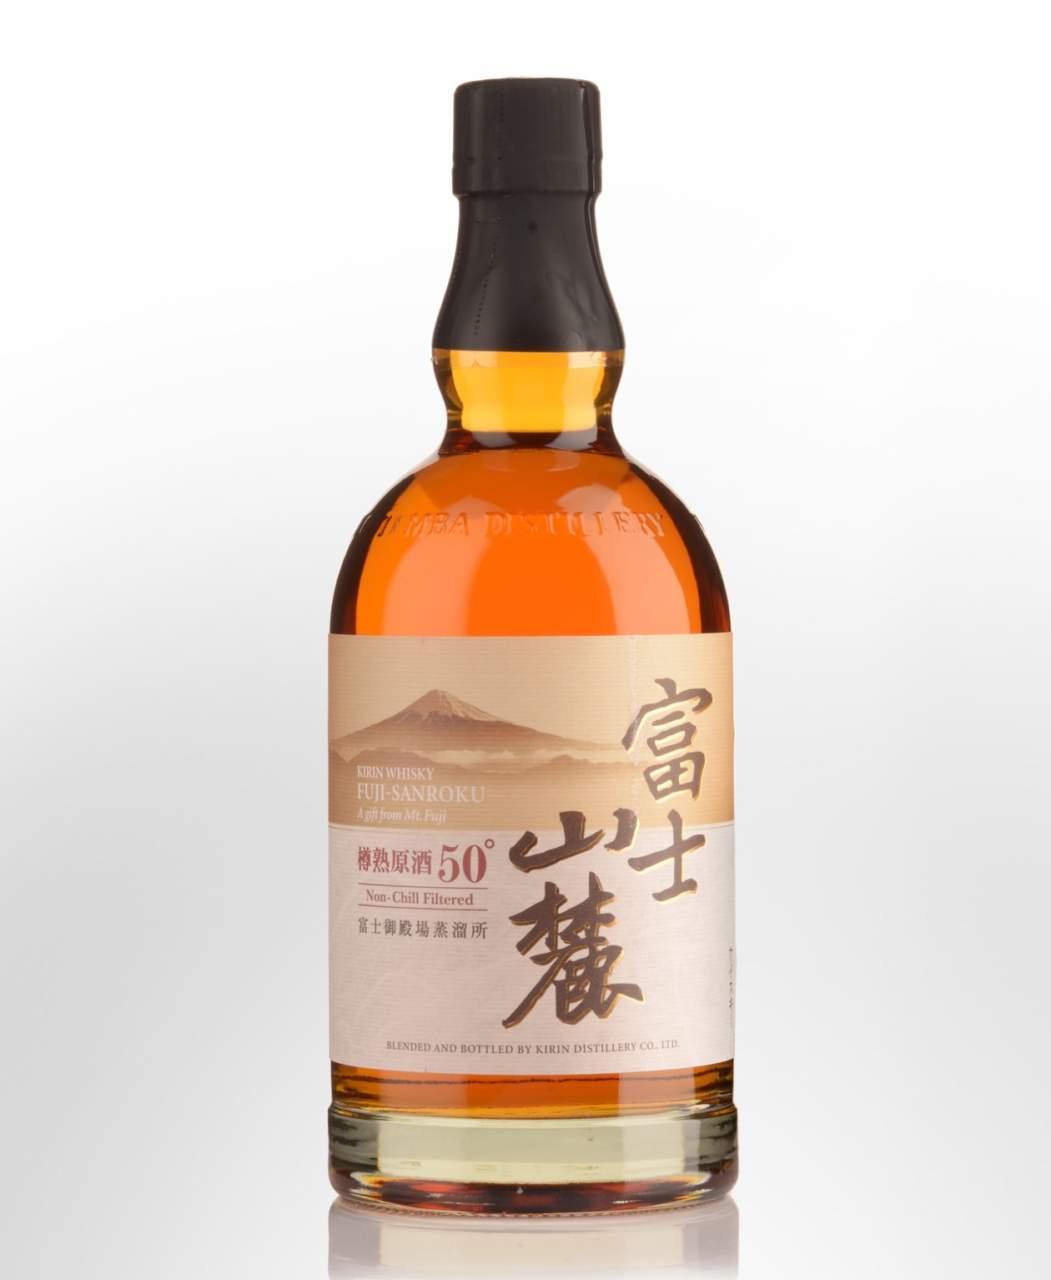 Kirin fuji sanrocku 50 japanese blended whisky bargiornale for Arredi 3n dei fratelli nespoli srl